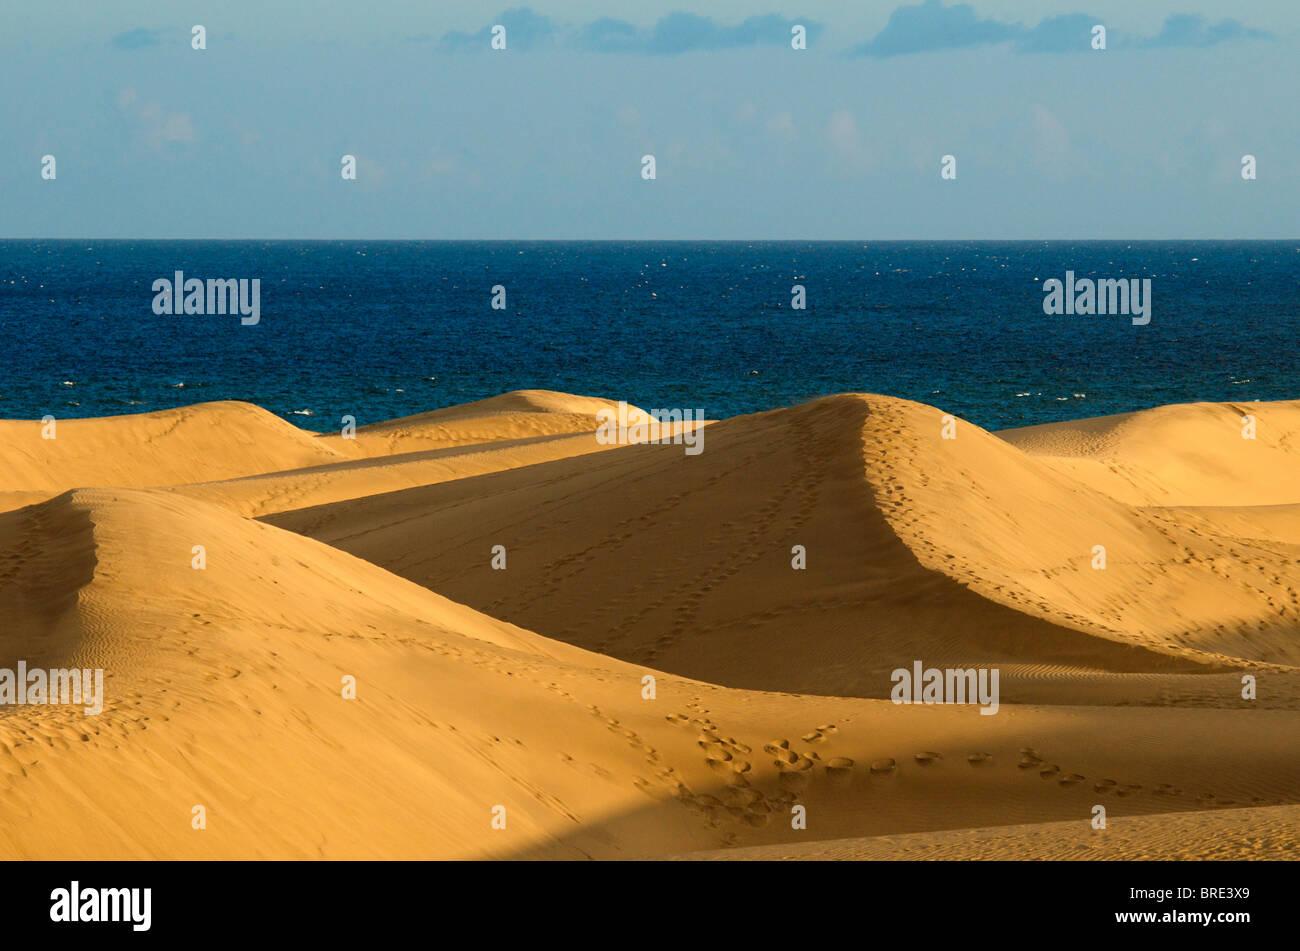 Dunes de sable de Maspalomas, Gran Canaria, Îles Canaries, Espagne Photo Stock